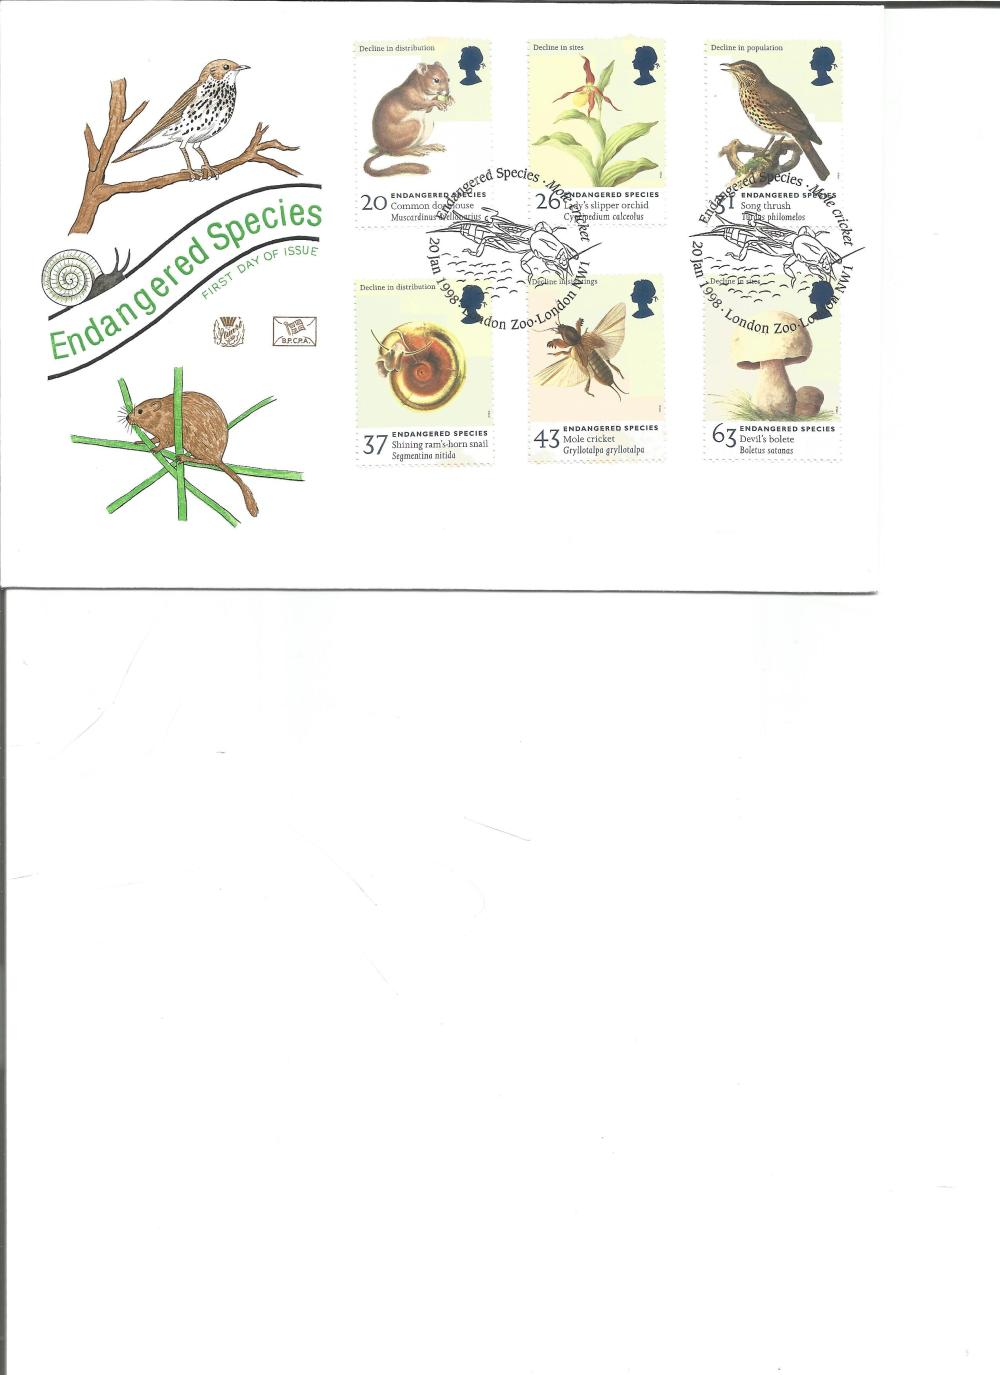 FDC Endangered Species c/w set of five commemorative stamps PM Endangered Species, Mole Cricket ,